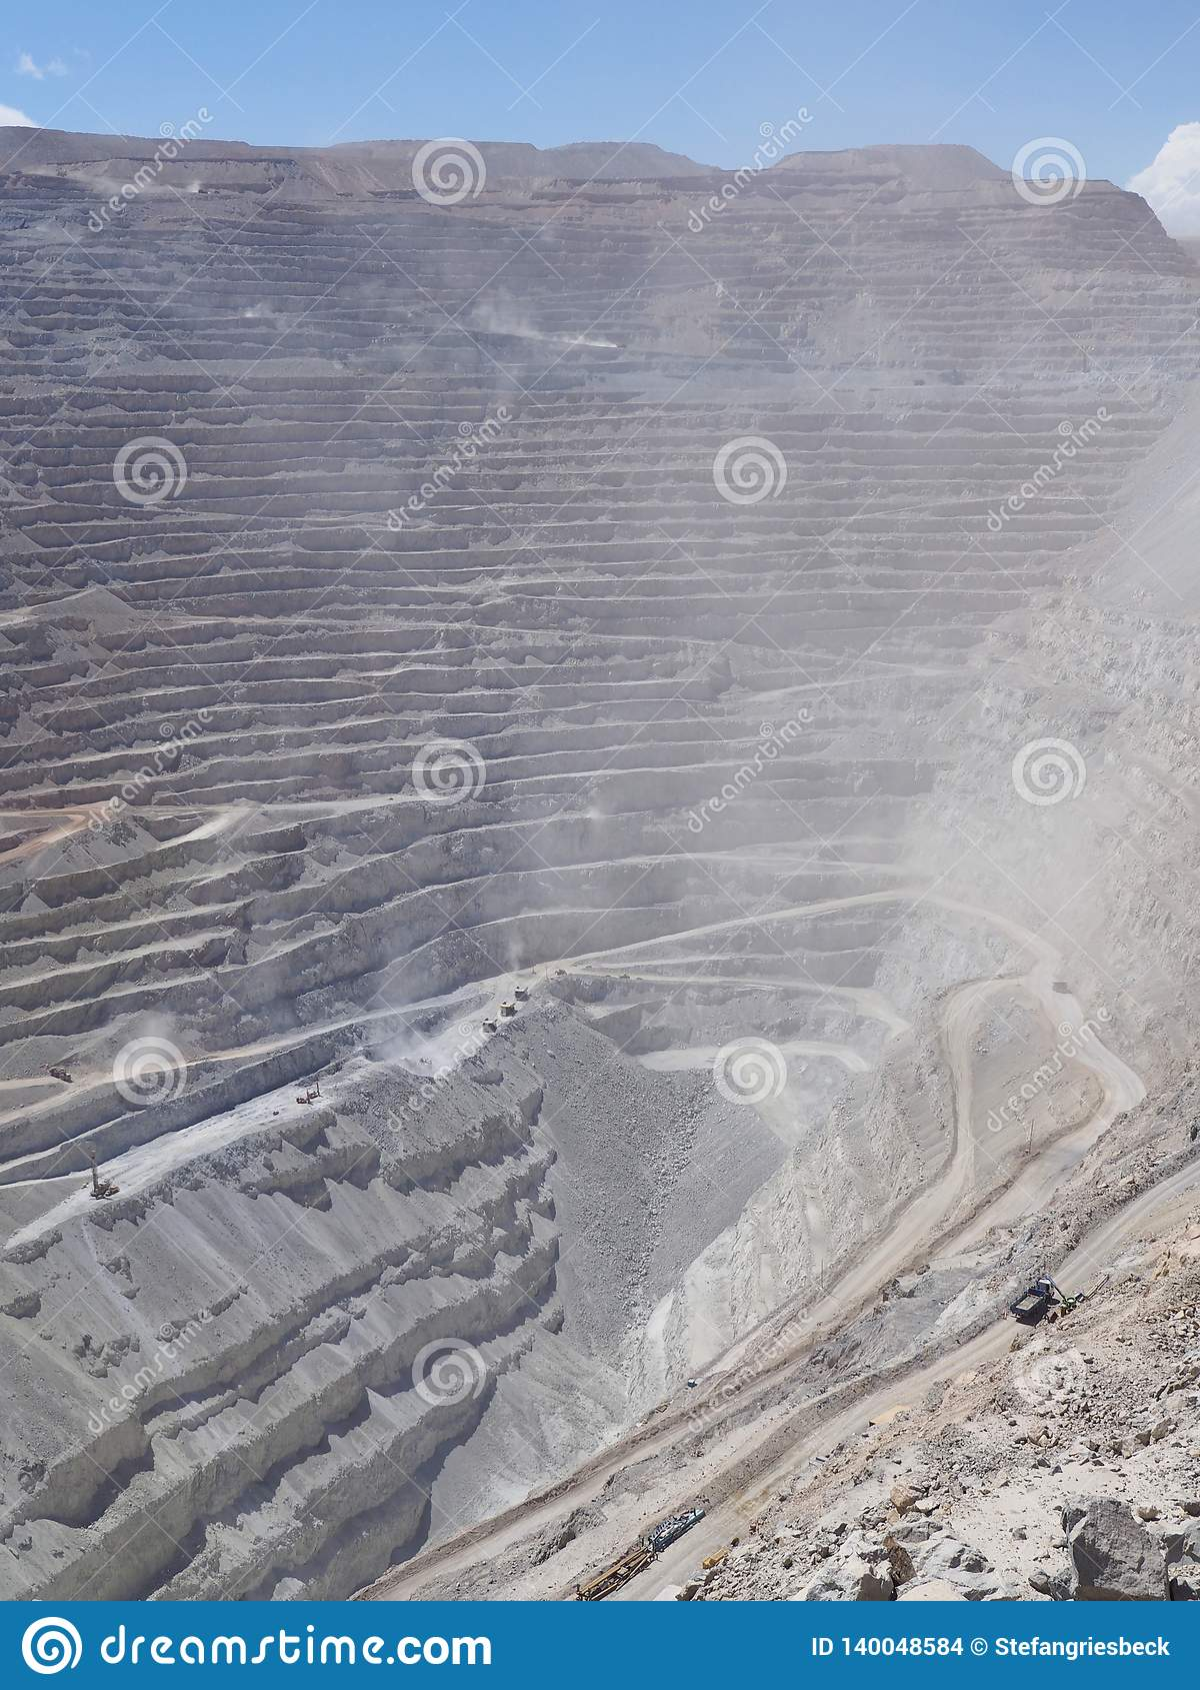 Mina de cobre Chuquicamata de poço aberto no Chile